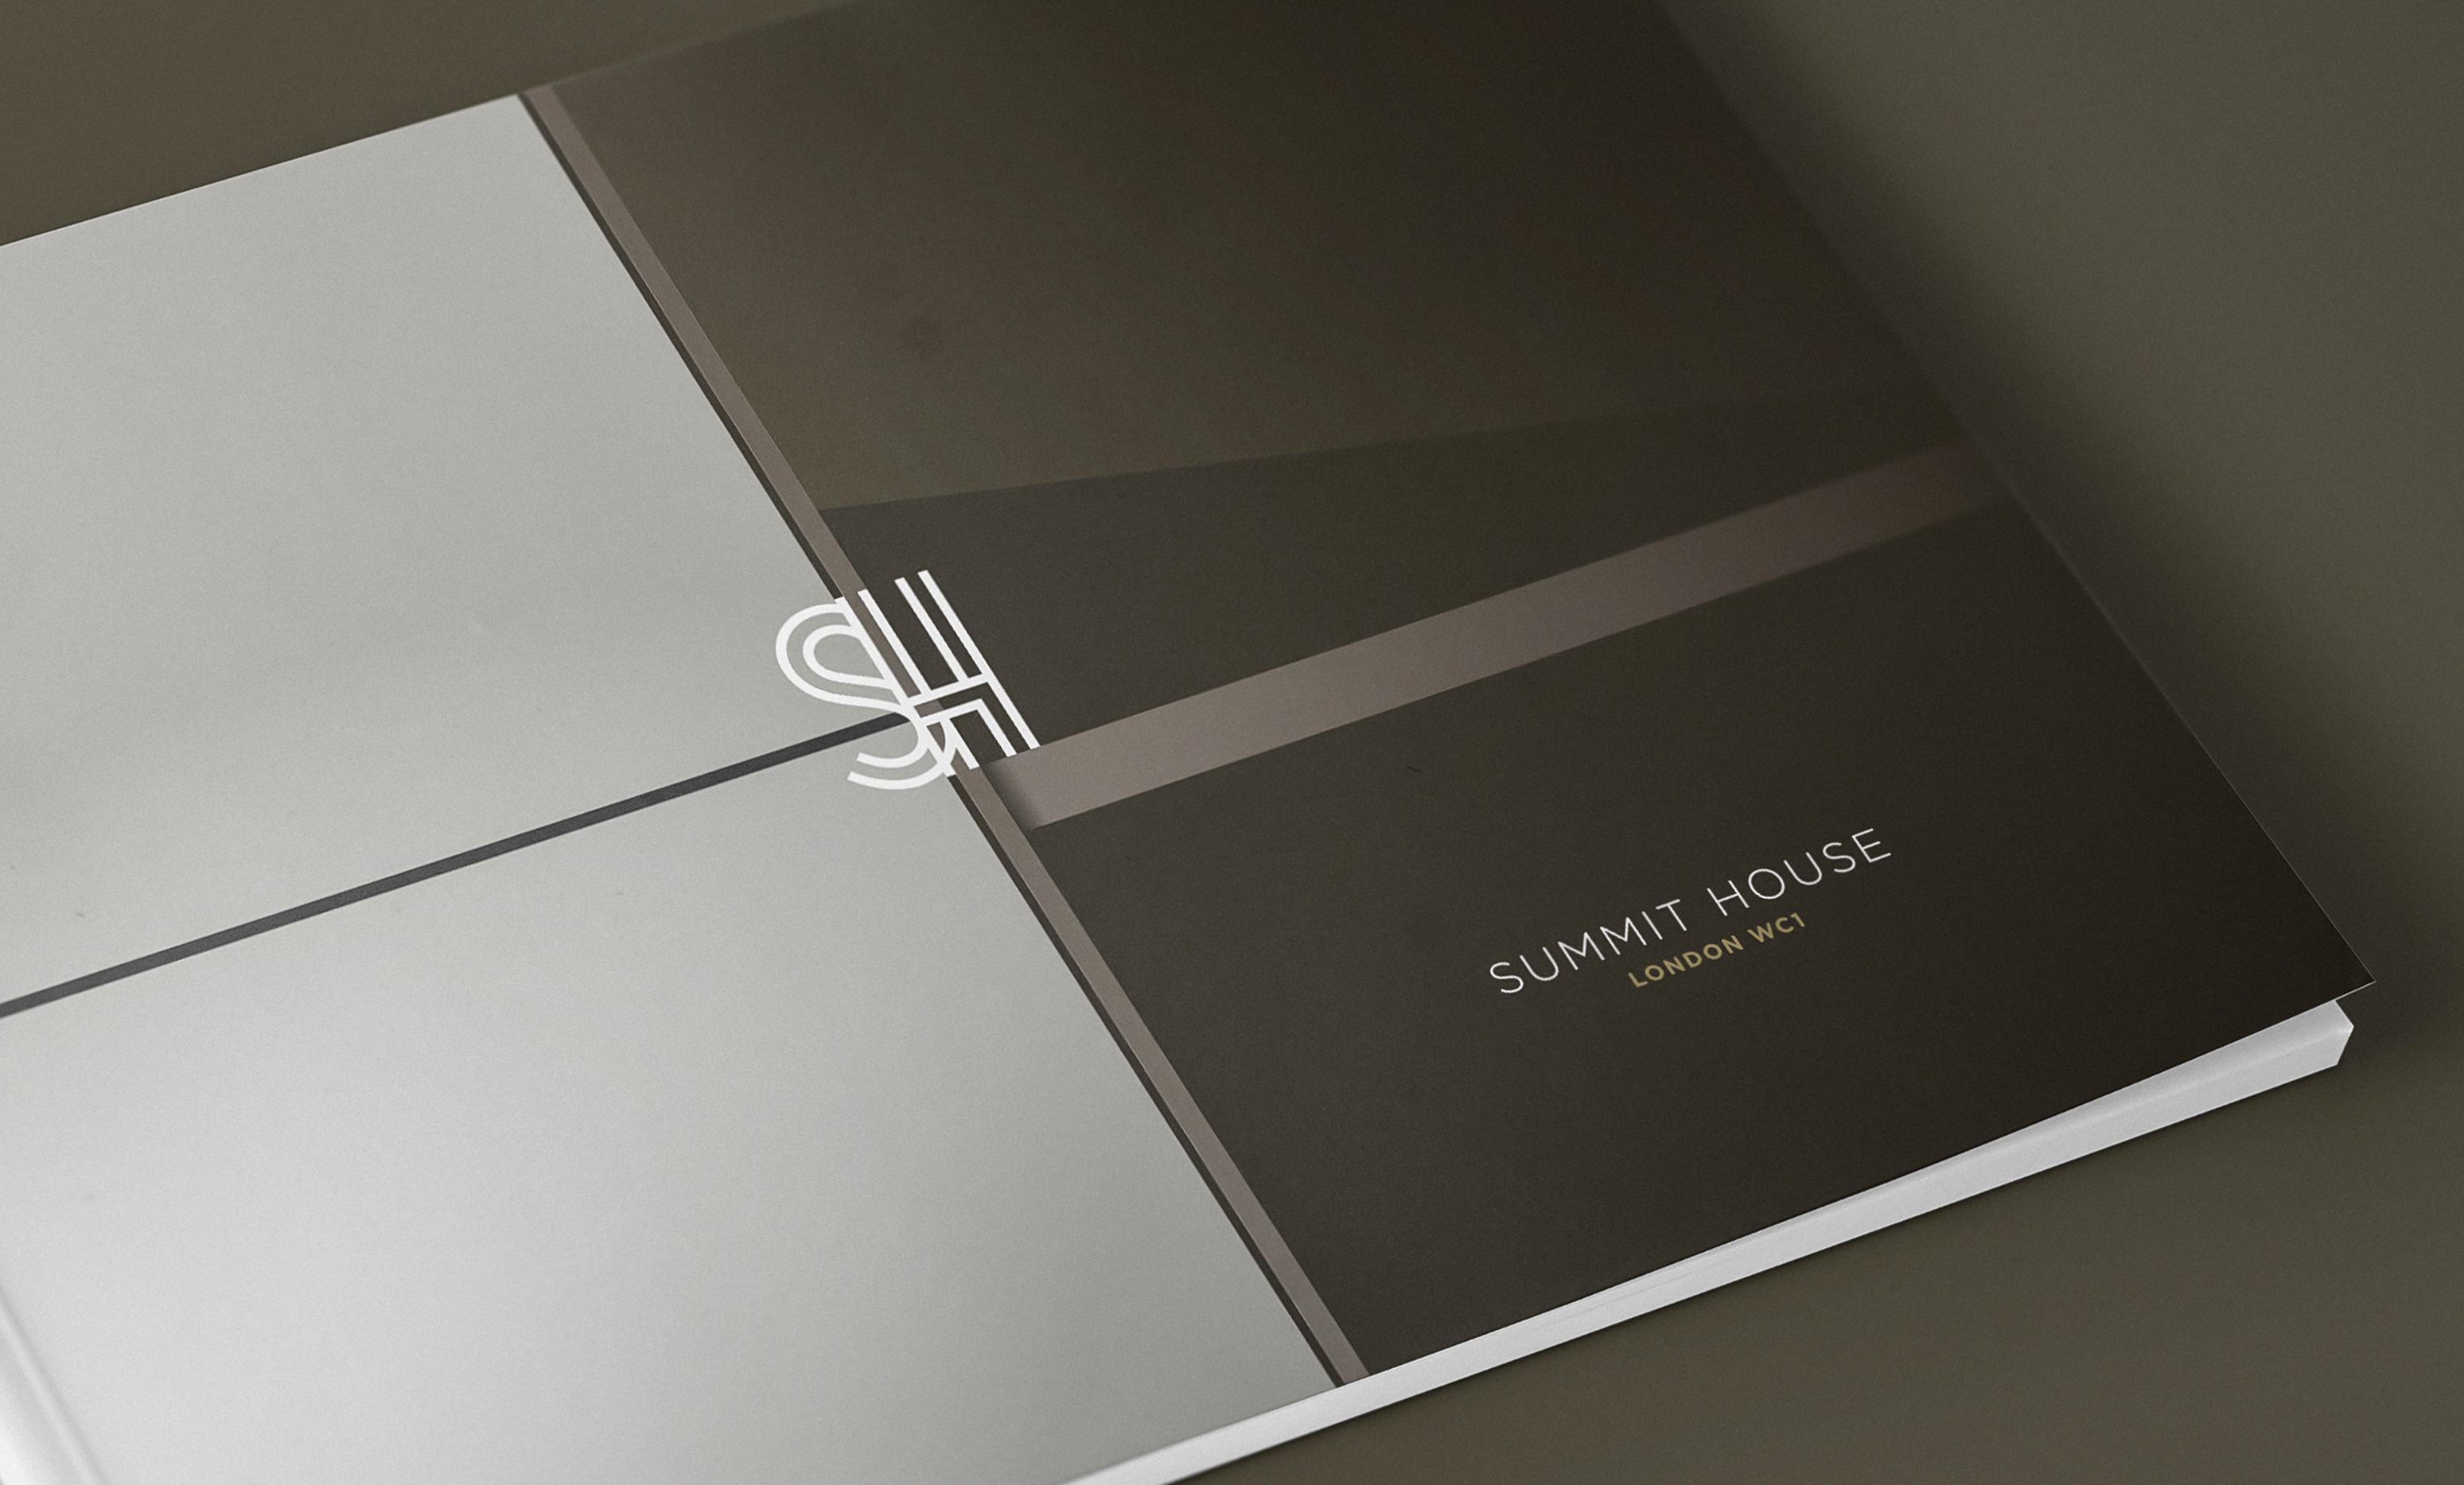 SH_Tech_Cover.jpg